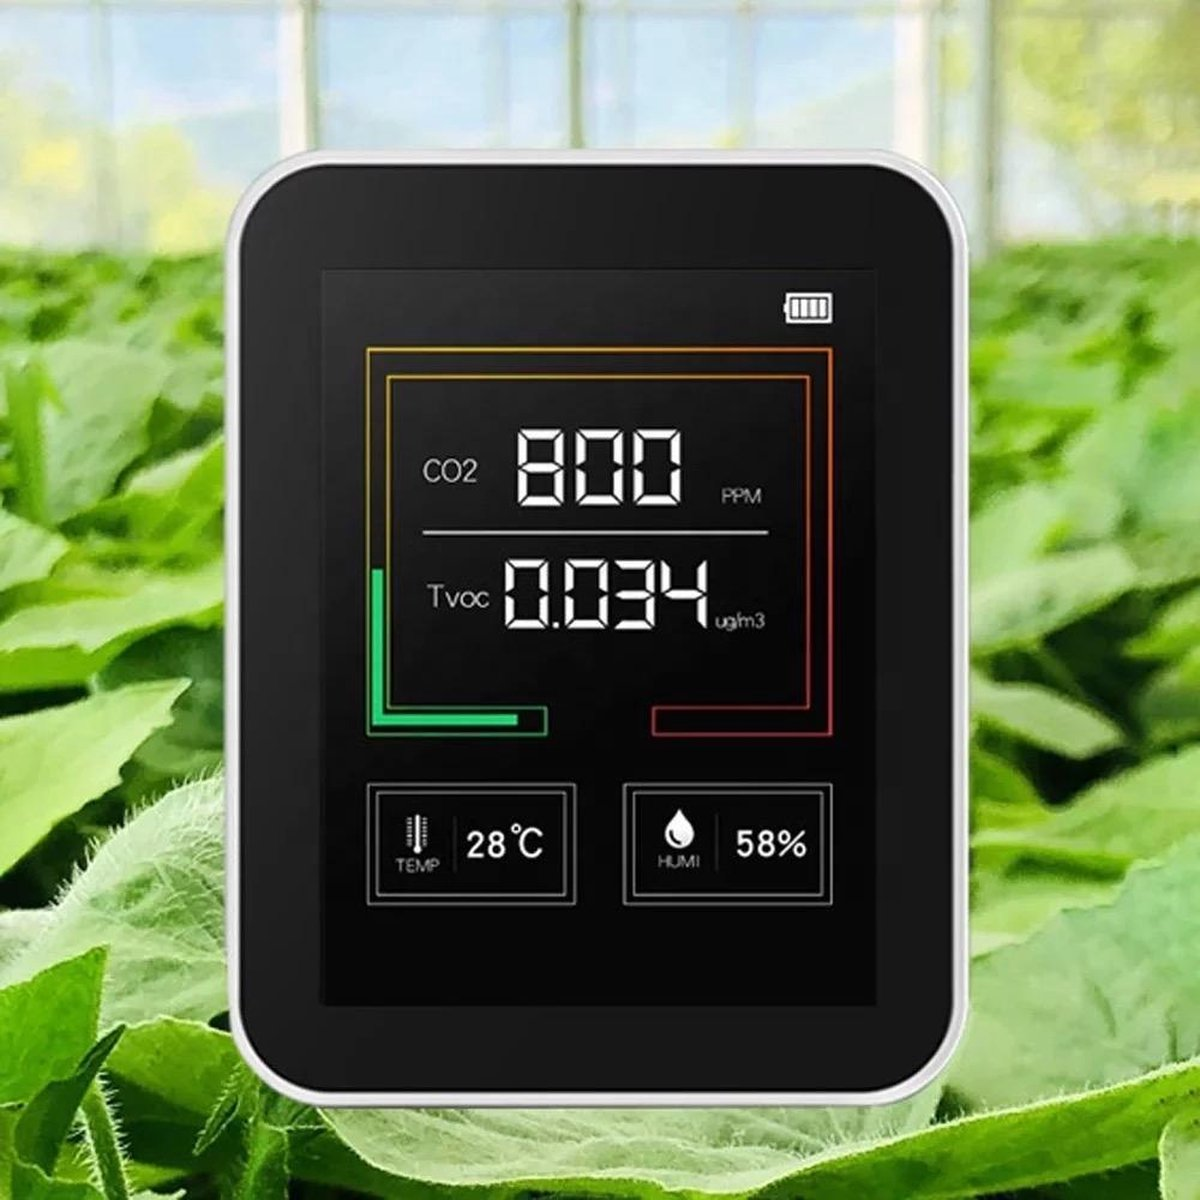 CO2 Meter - co2 meter binnen - AirQua Pro co2 melder - luchtkwaliteitsmeters - co2 - Temperatuurmete